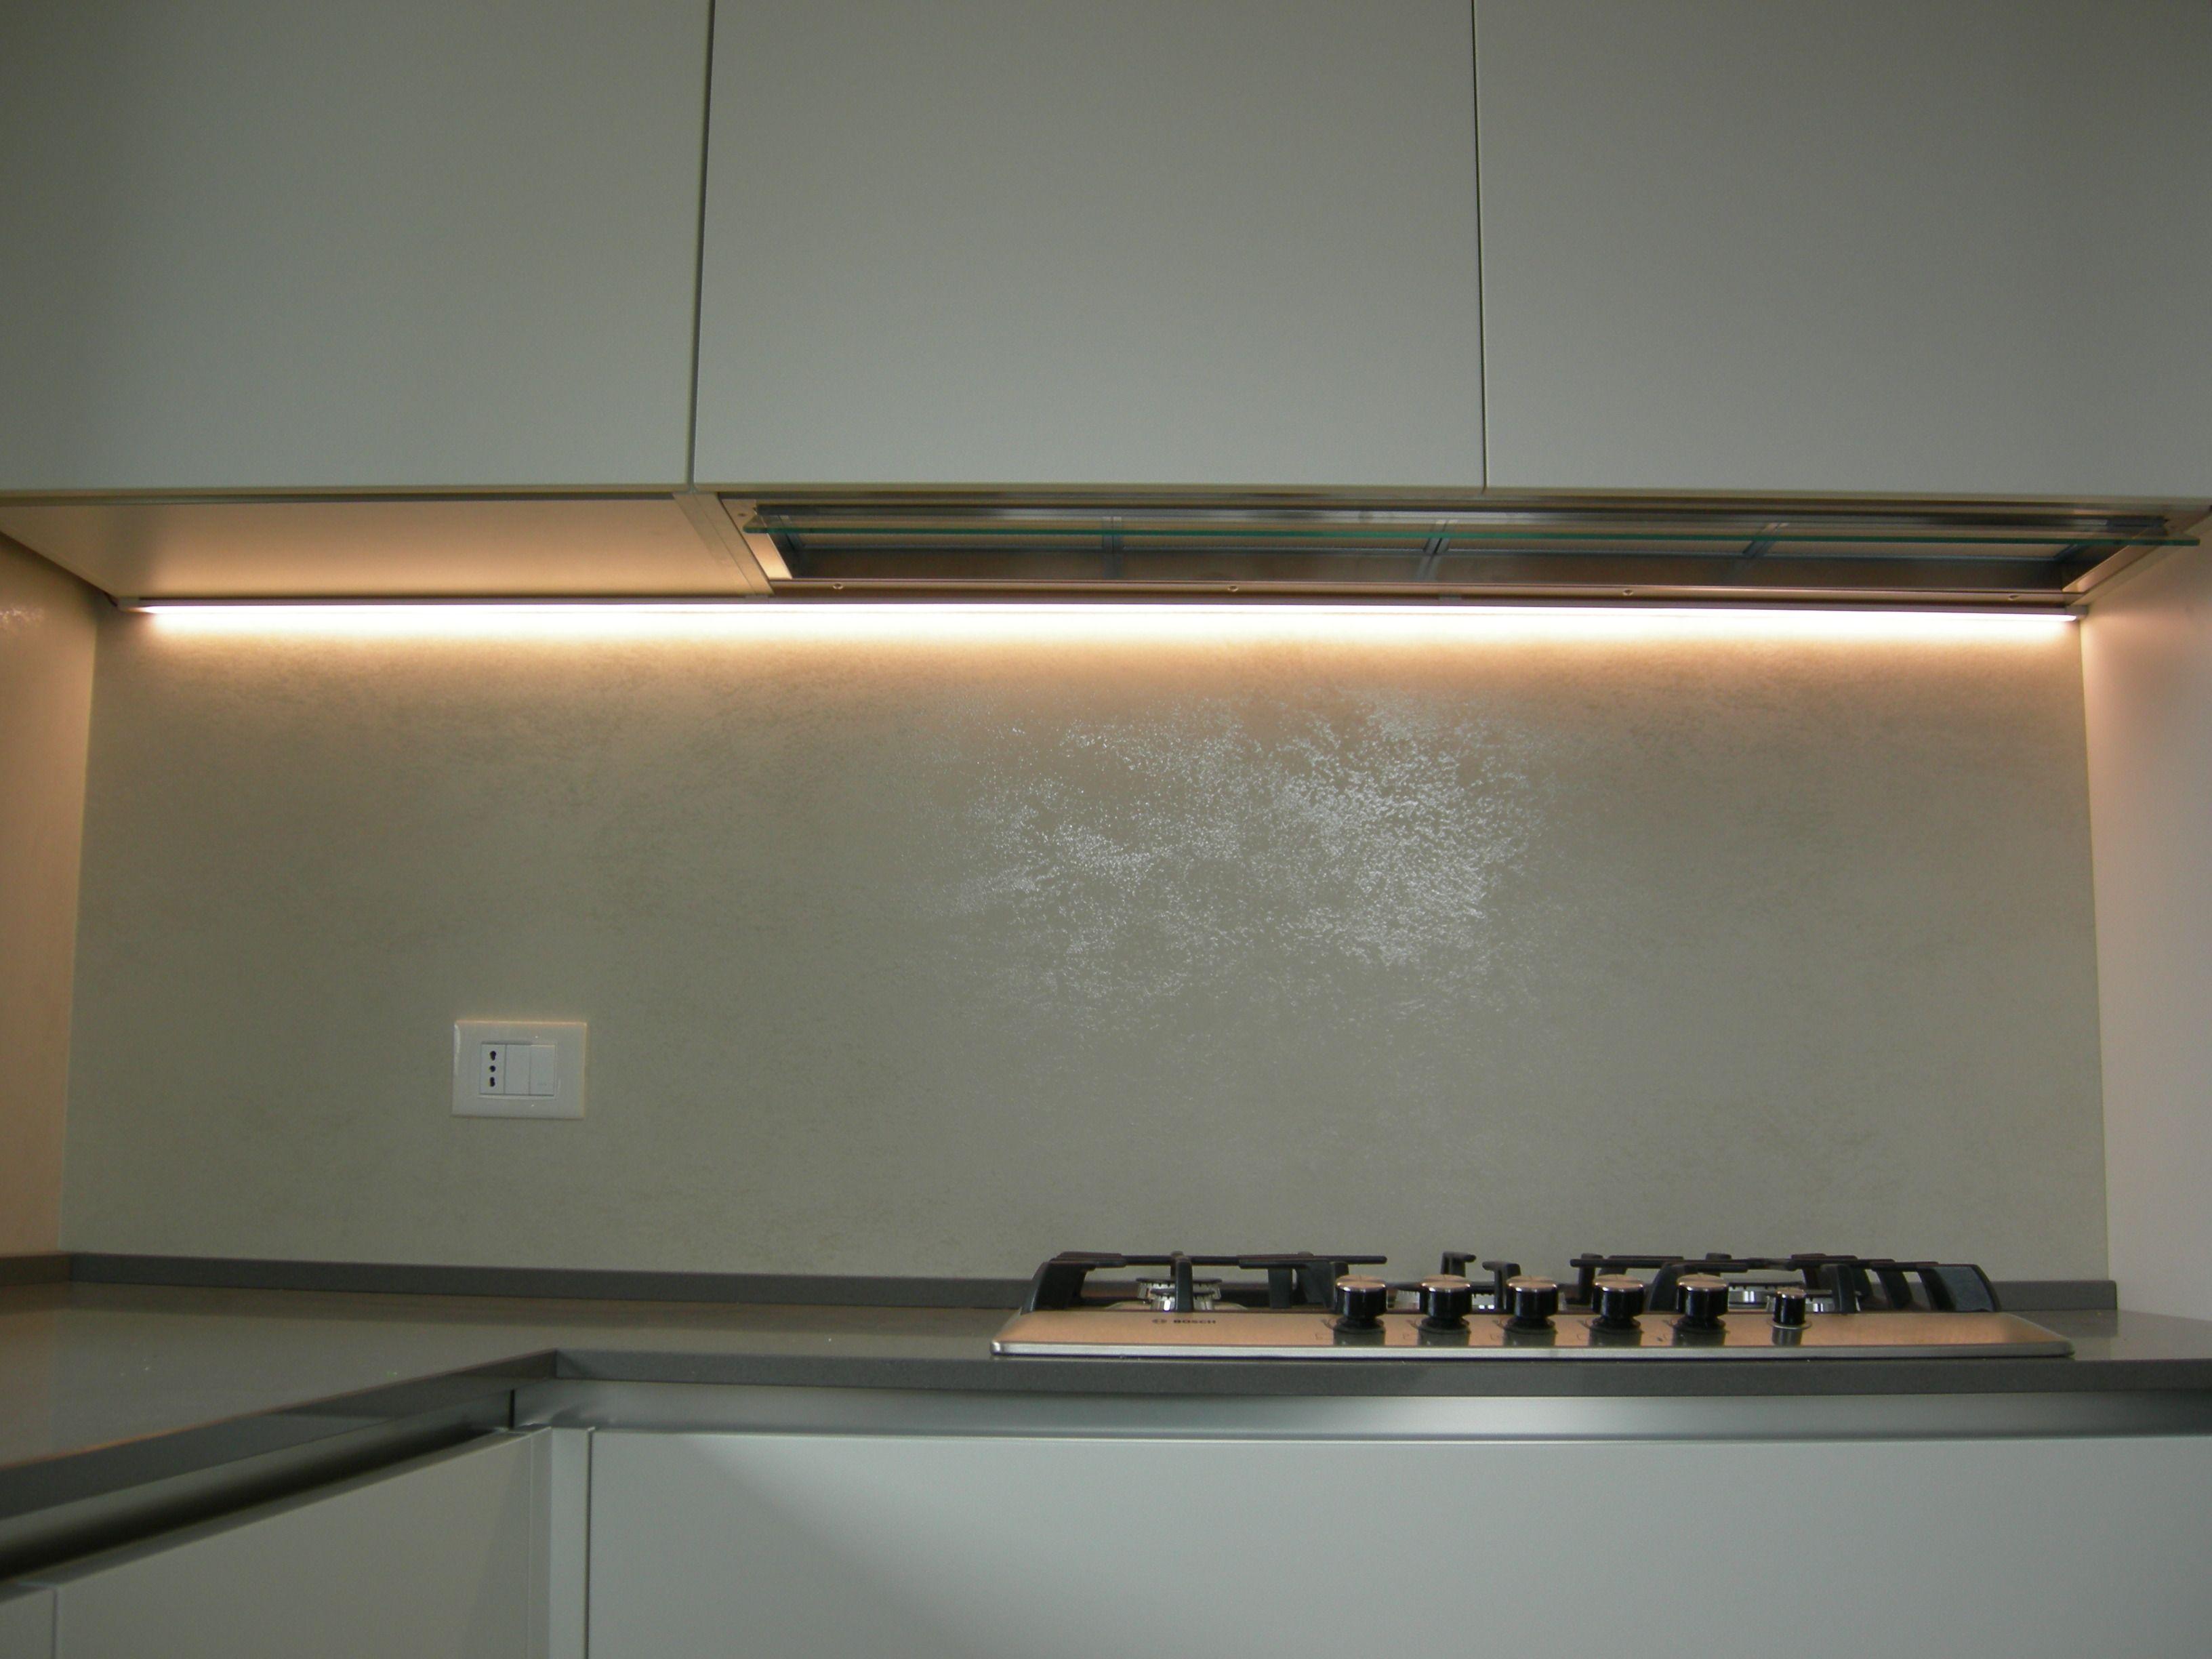 Cucina Hacker Systemat Laccato Bianco Opaco sotto pensili con luce a ...